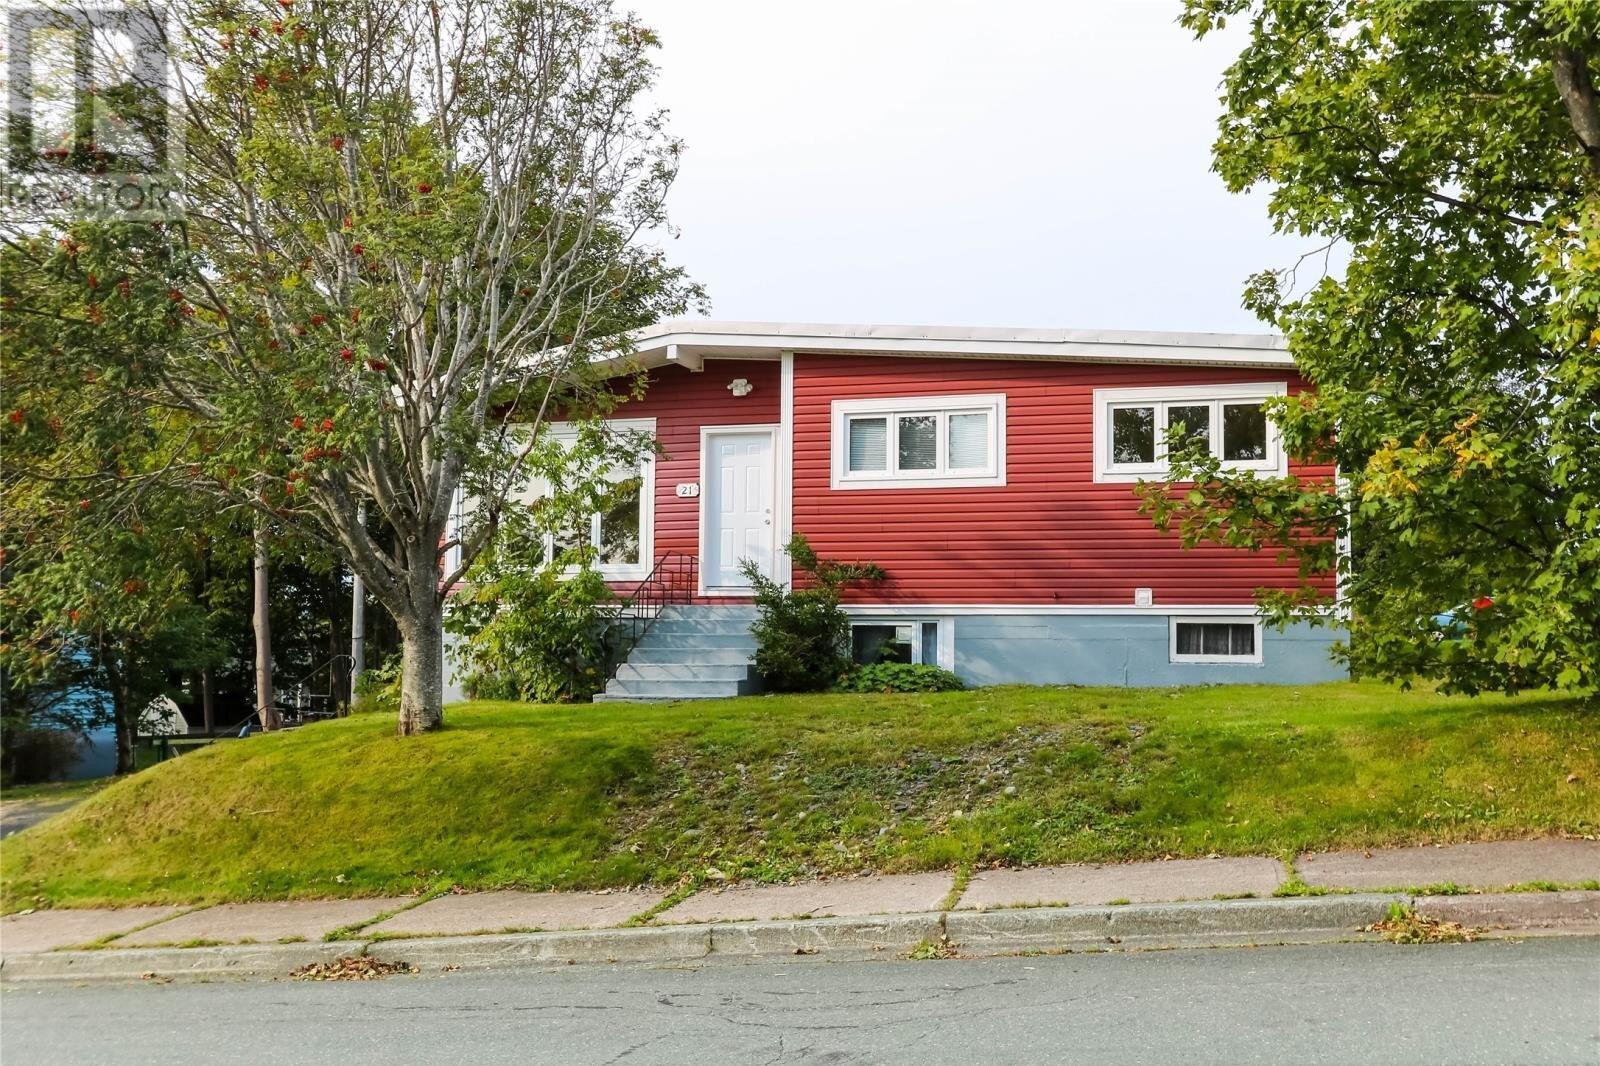 House for sale at 21 Pleasantville Ave St. John's Newfoundland - MLS: 1221618